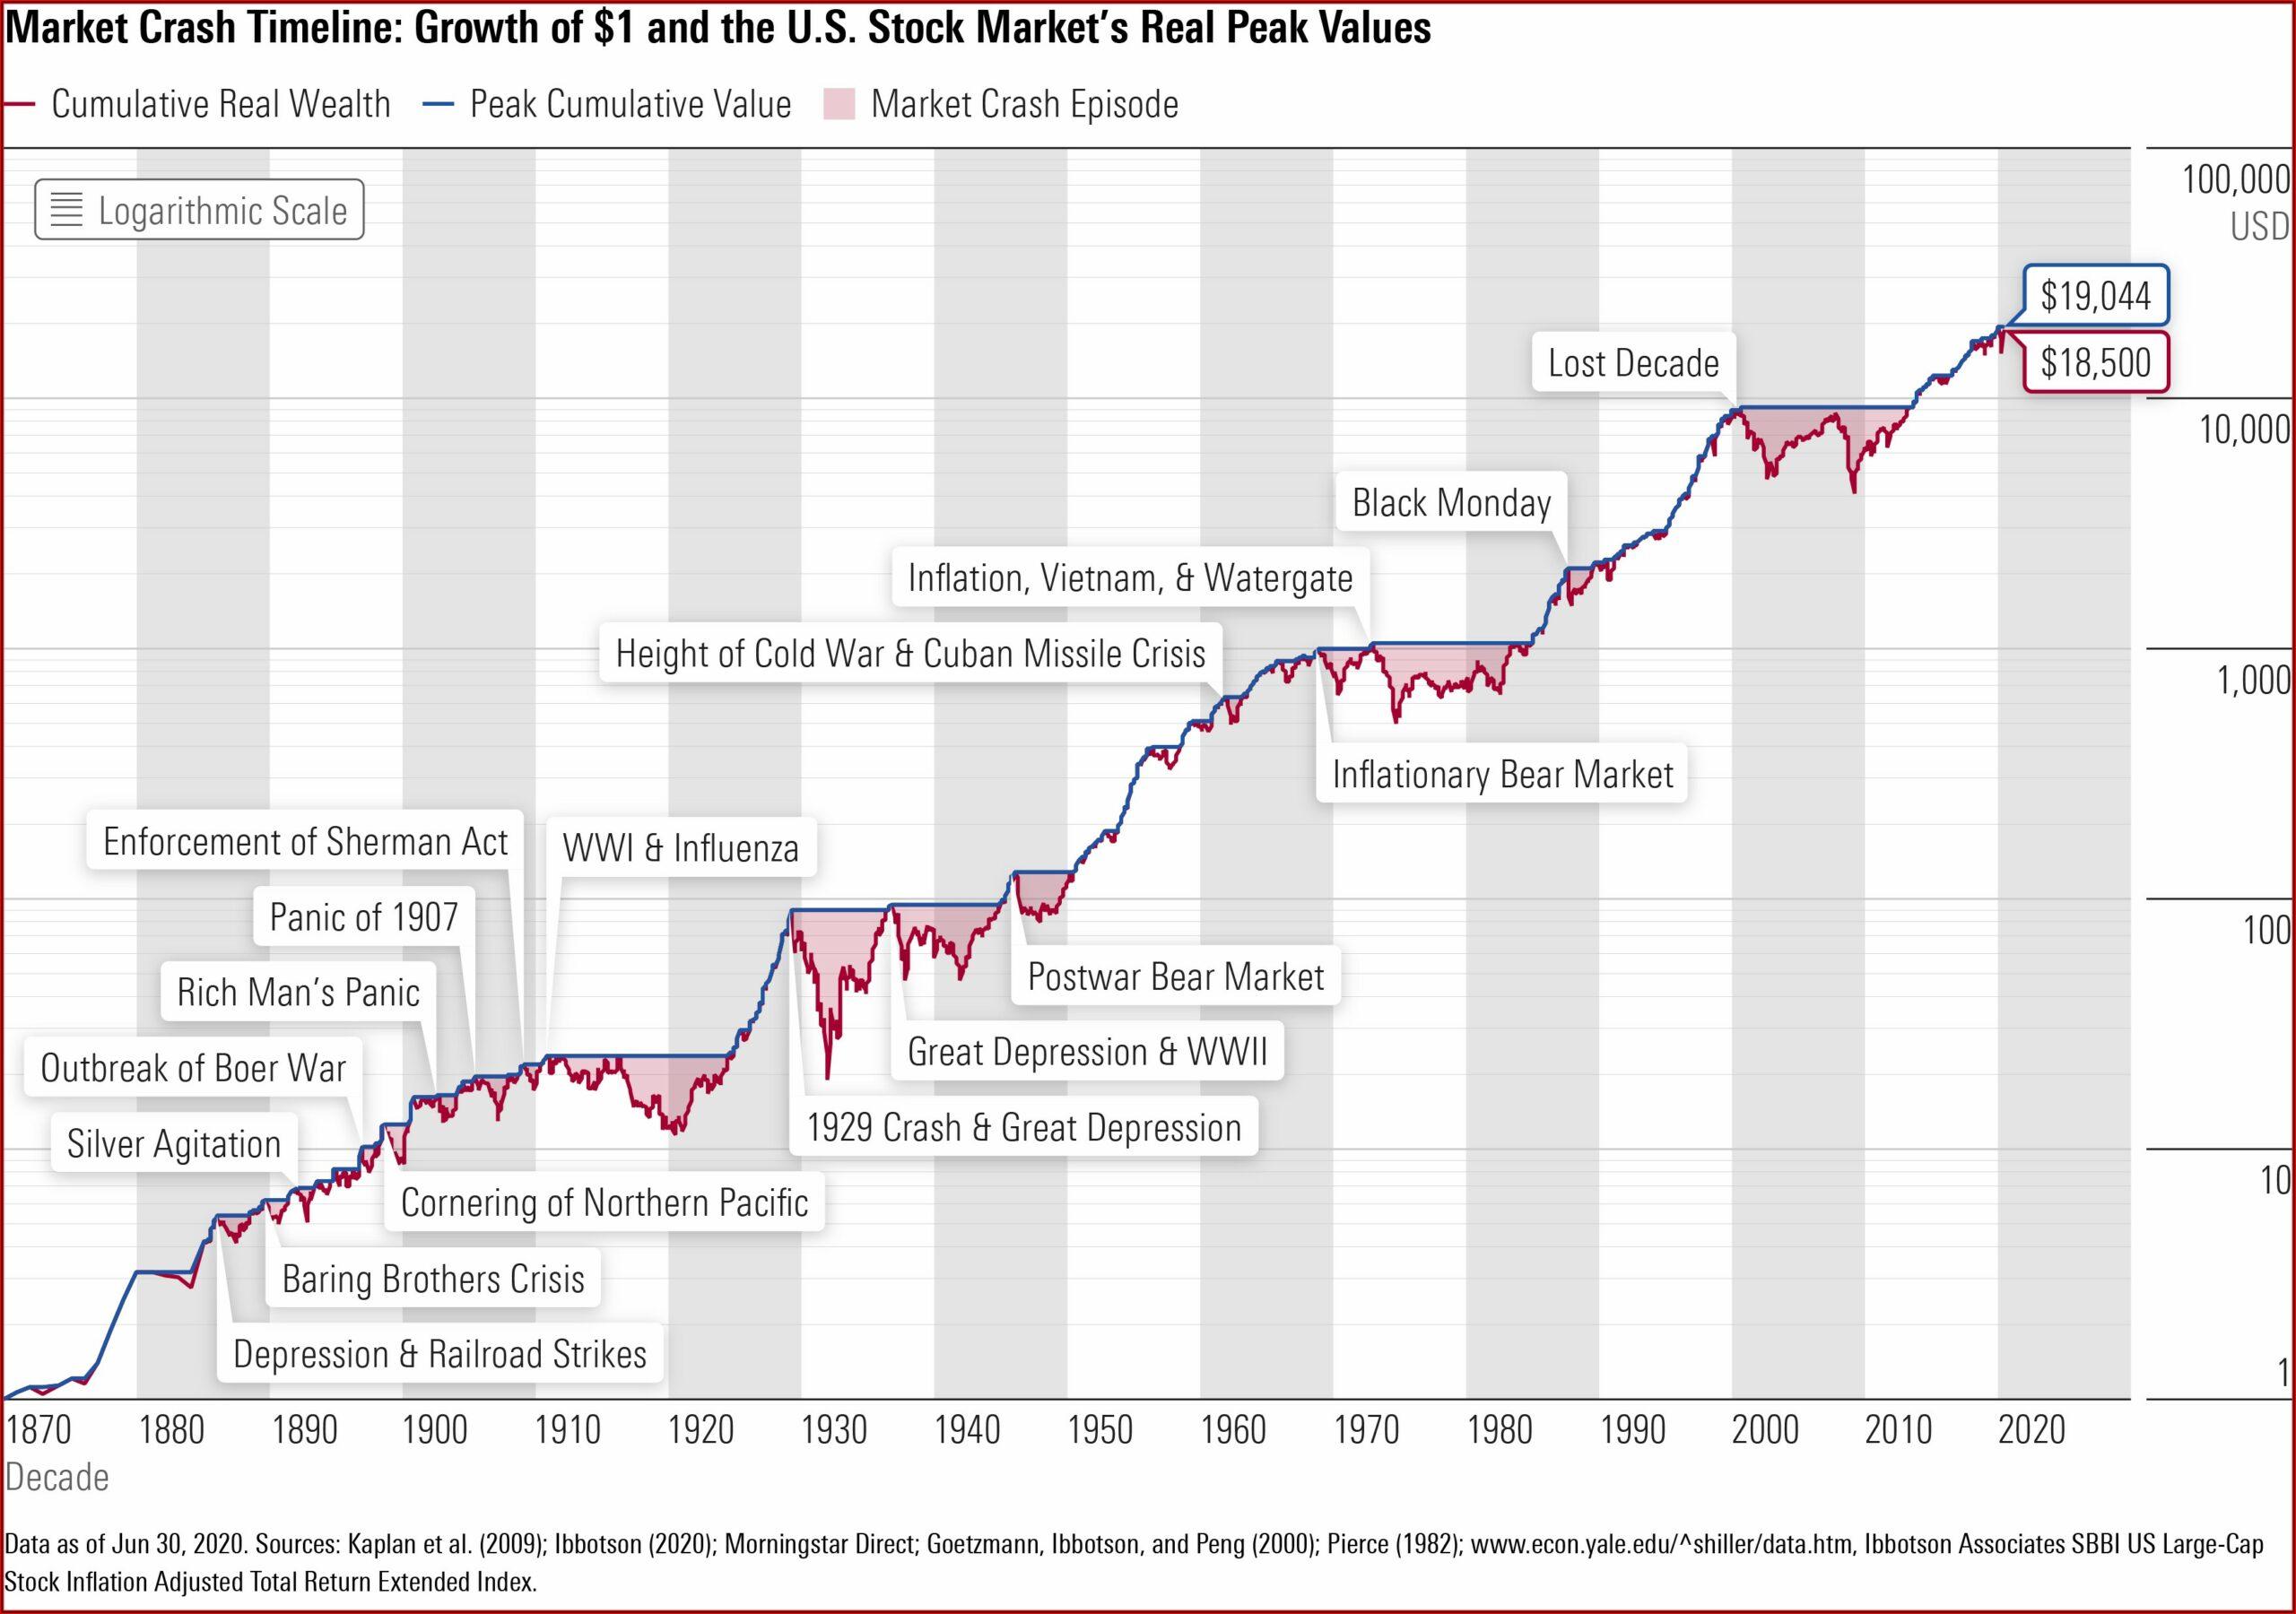 Stock Market Crashes Timeline Graph